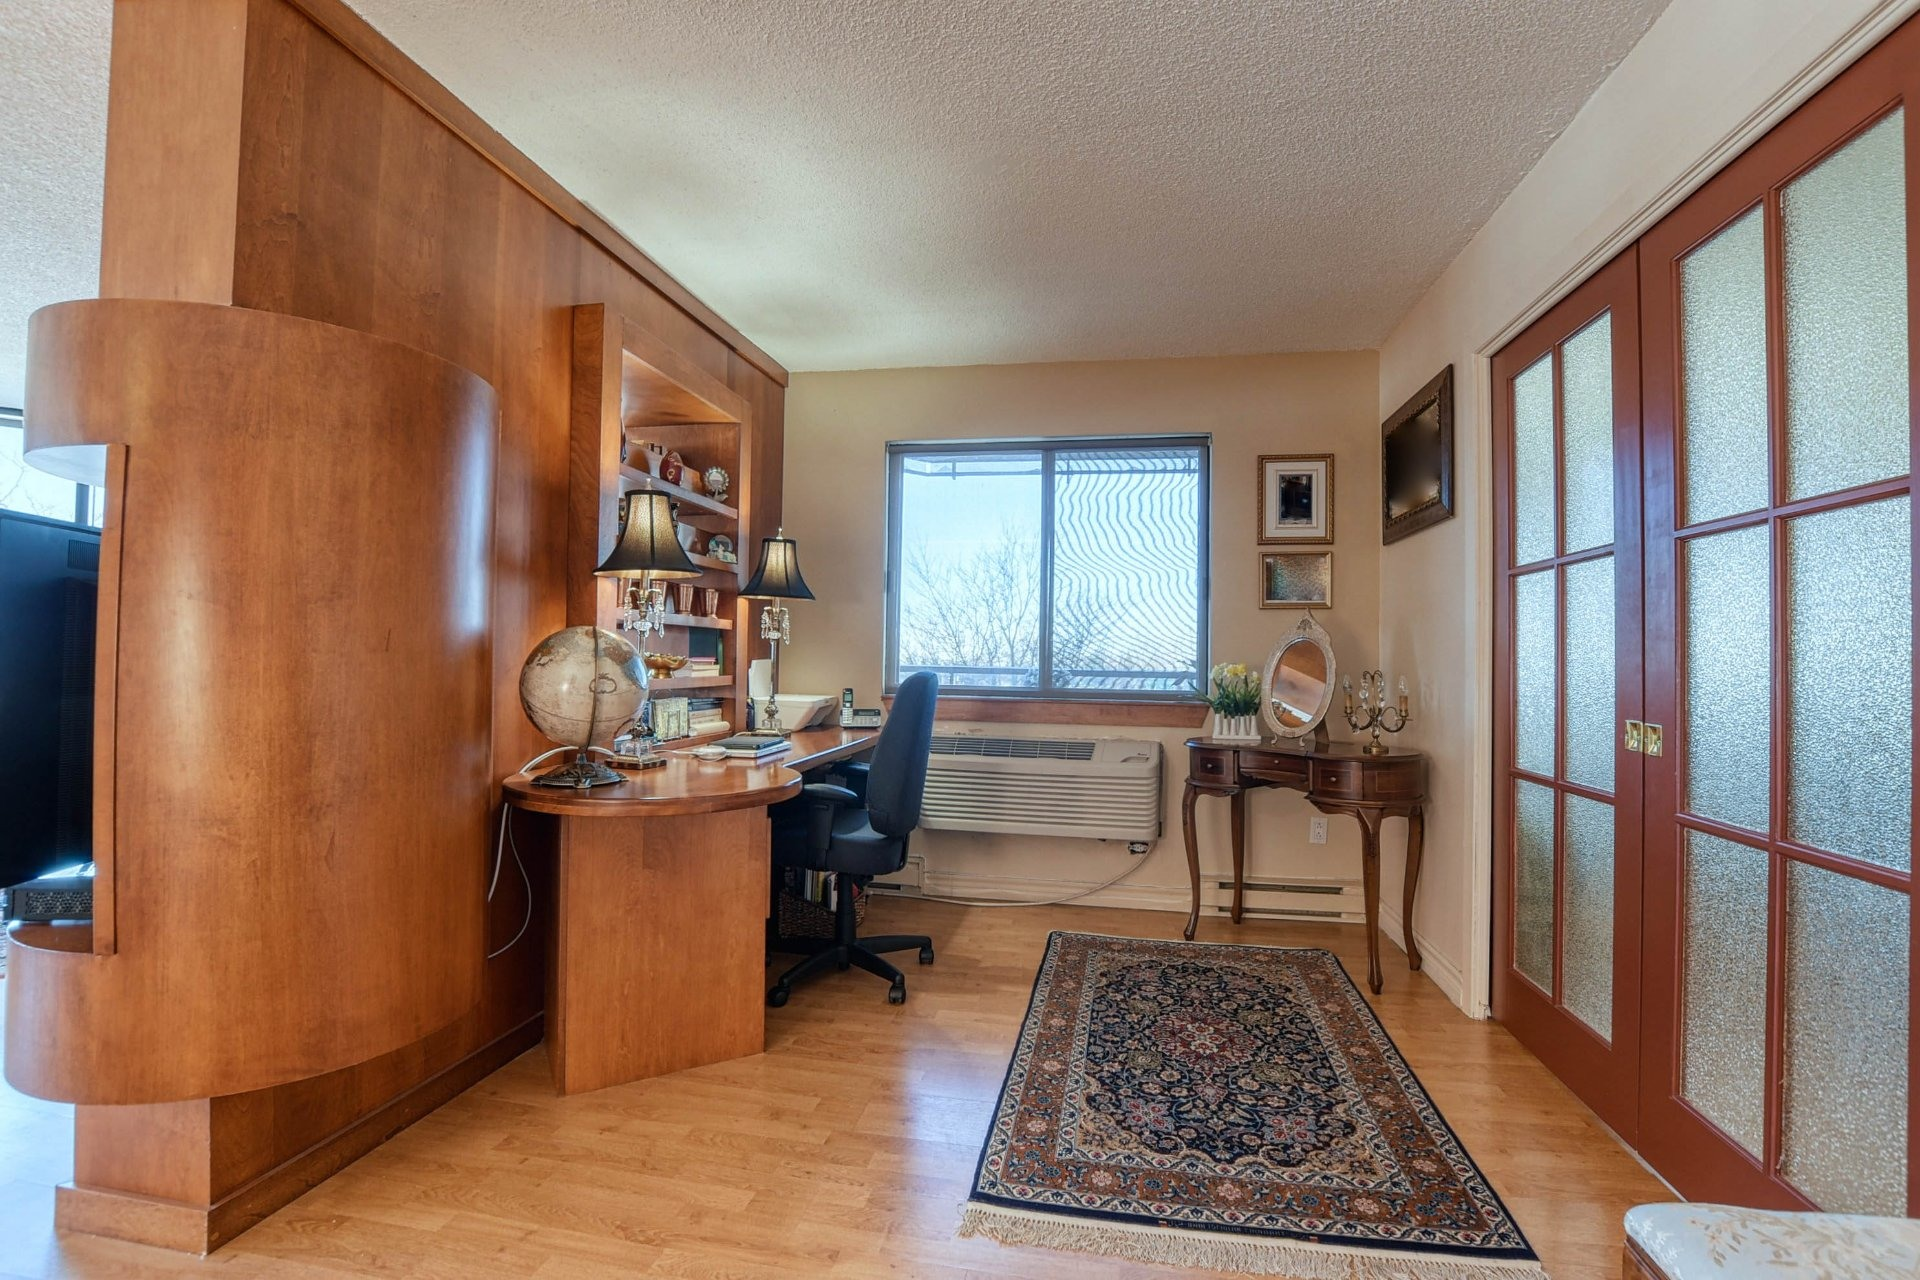 image 3 - Apartment For sale Le Vieux-Longueuil Longueuil  - 6 rooms